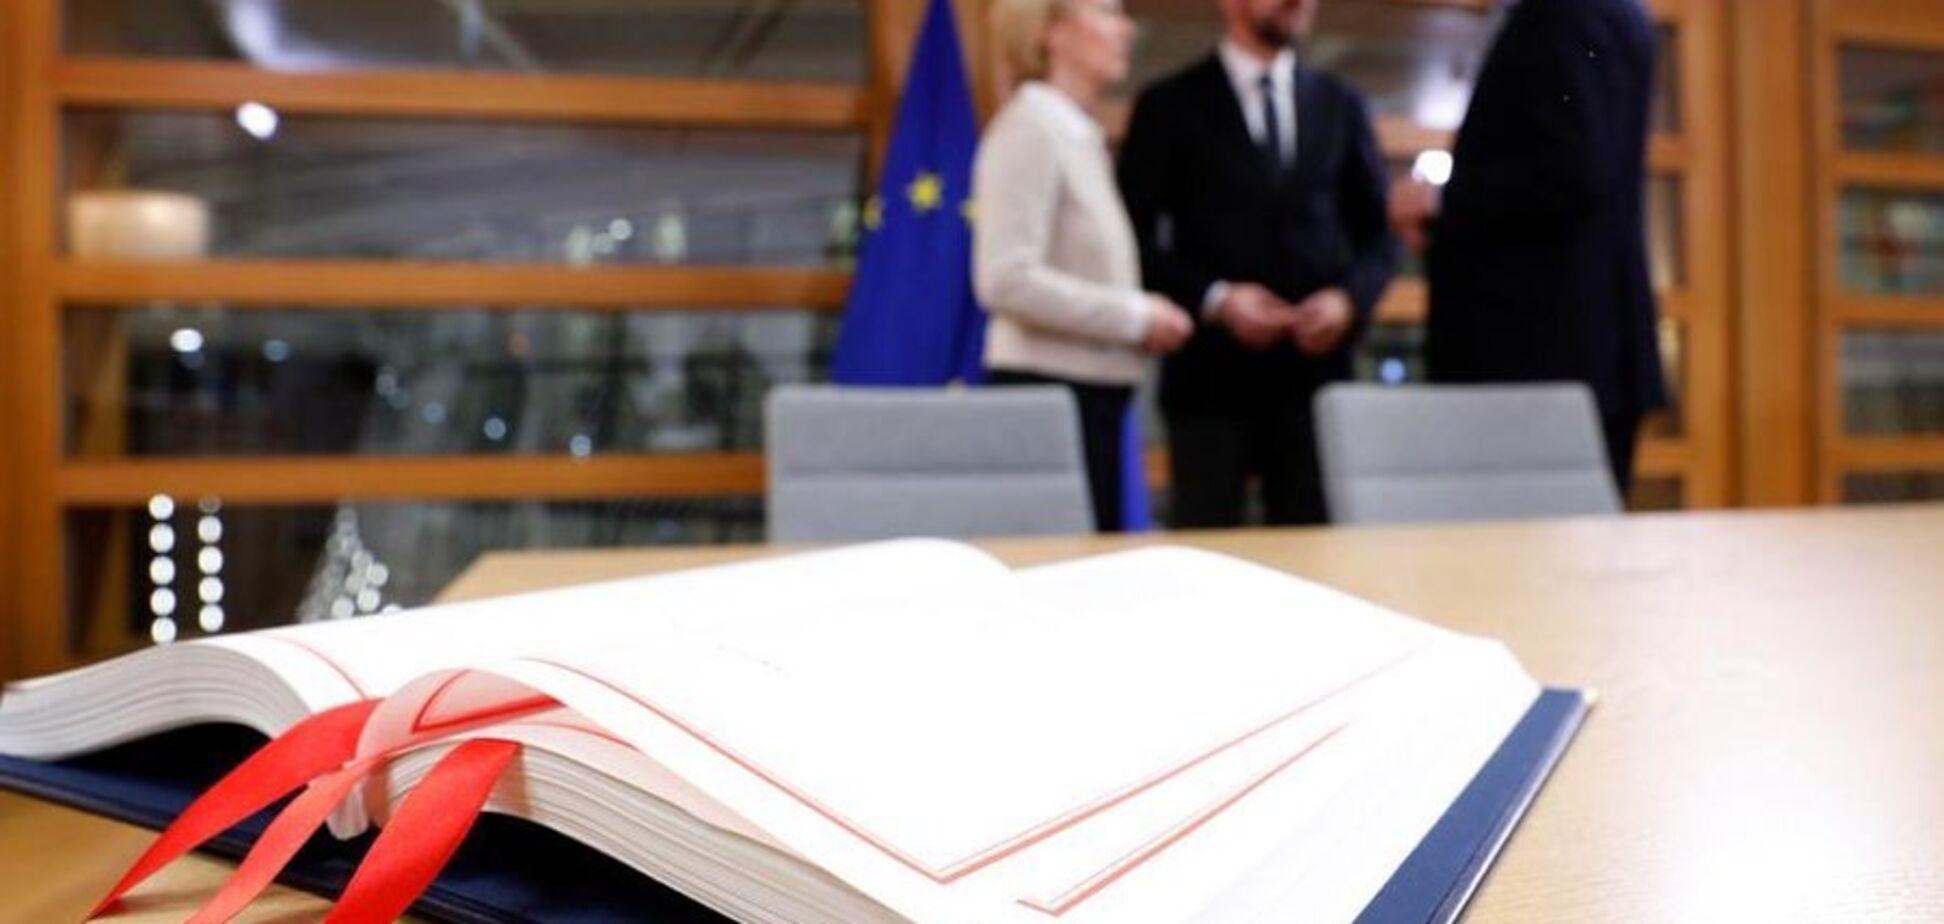 Глави ЄС підписали угоду про Brexit